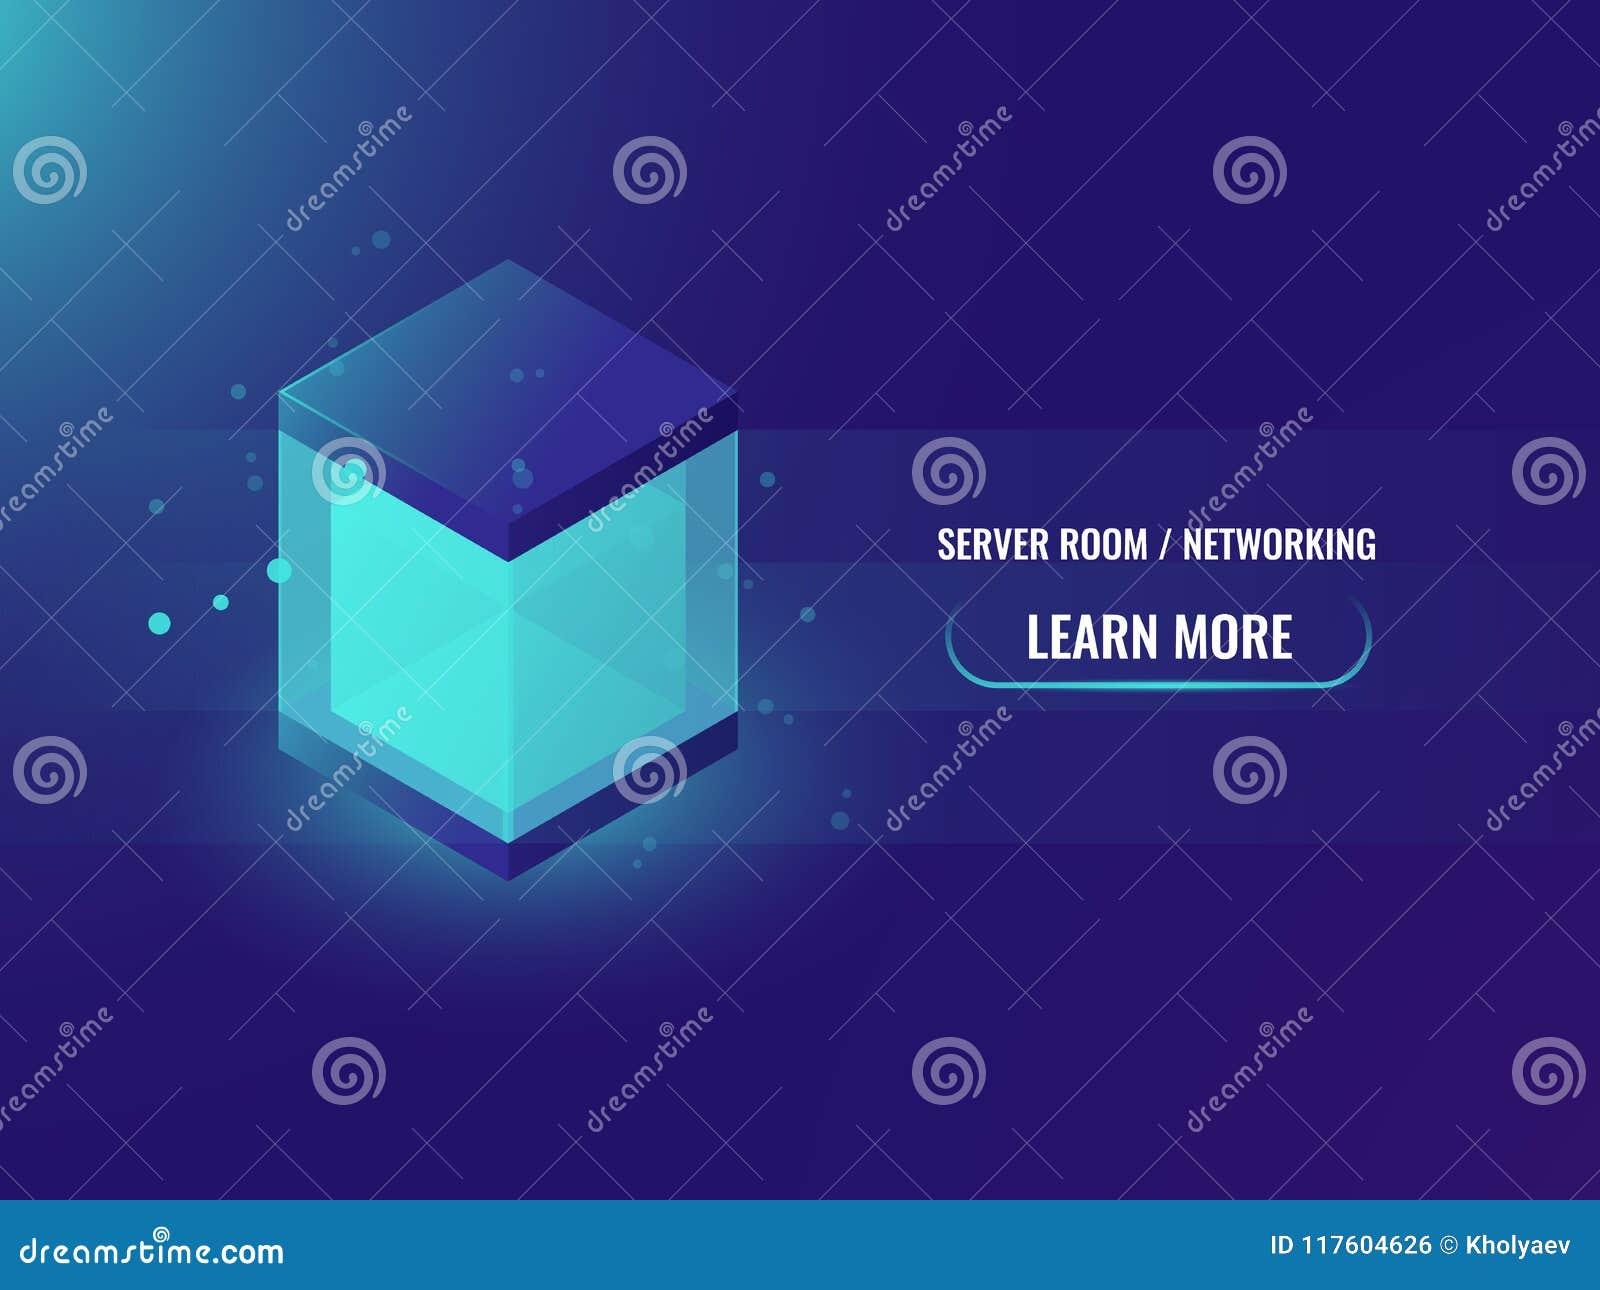 Isometric neon big data storage block concept, abstract technology banner, shining cube box, blockchain vector